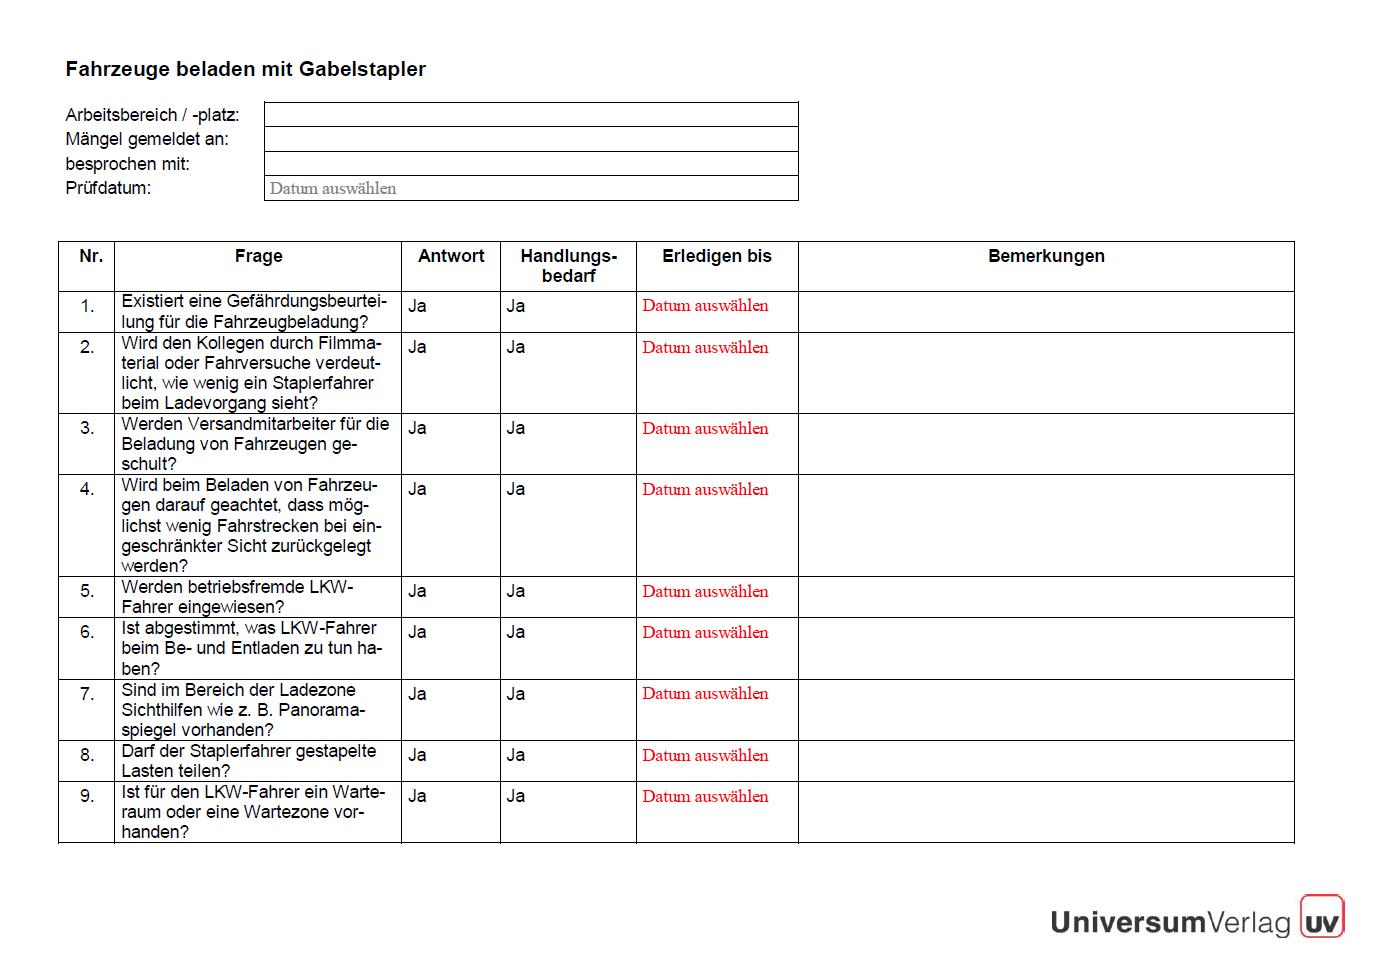 Checkliste Fahrzeuge Beladen Mit Gabelstapler Sofort Download